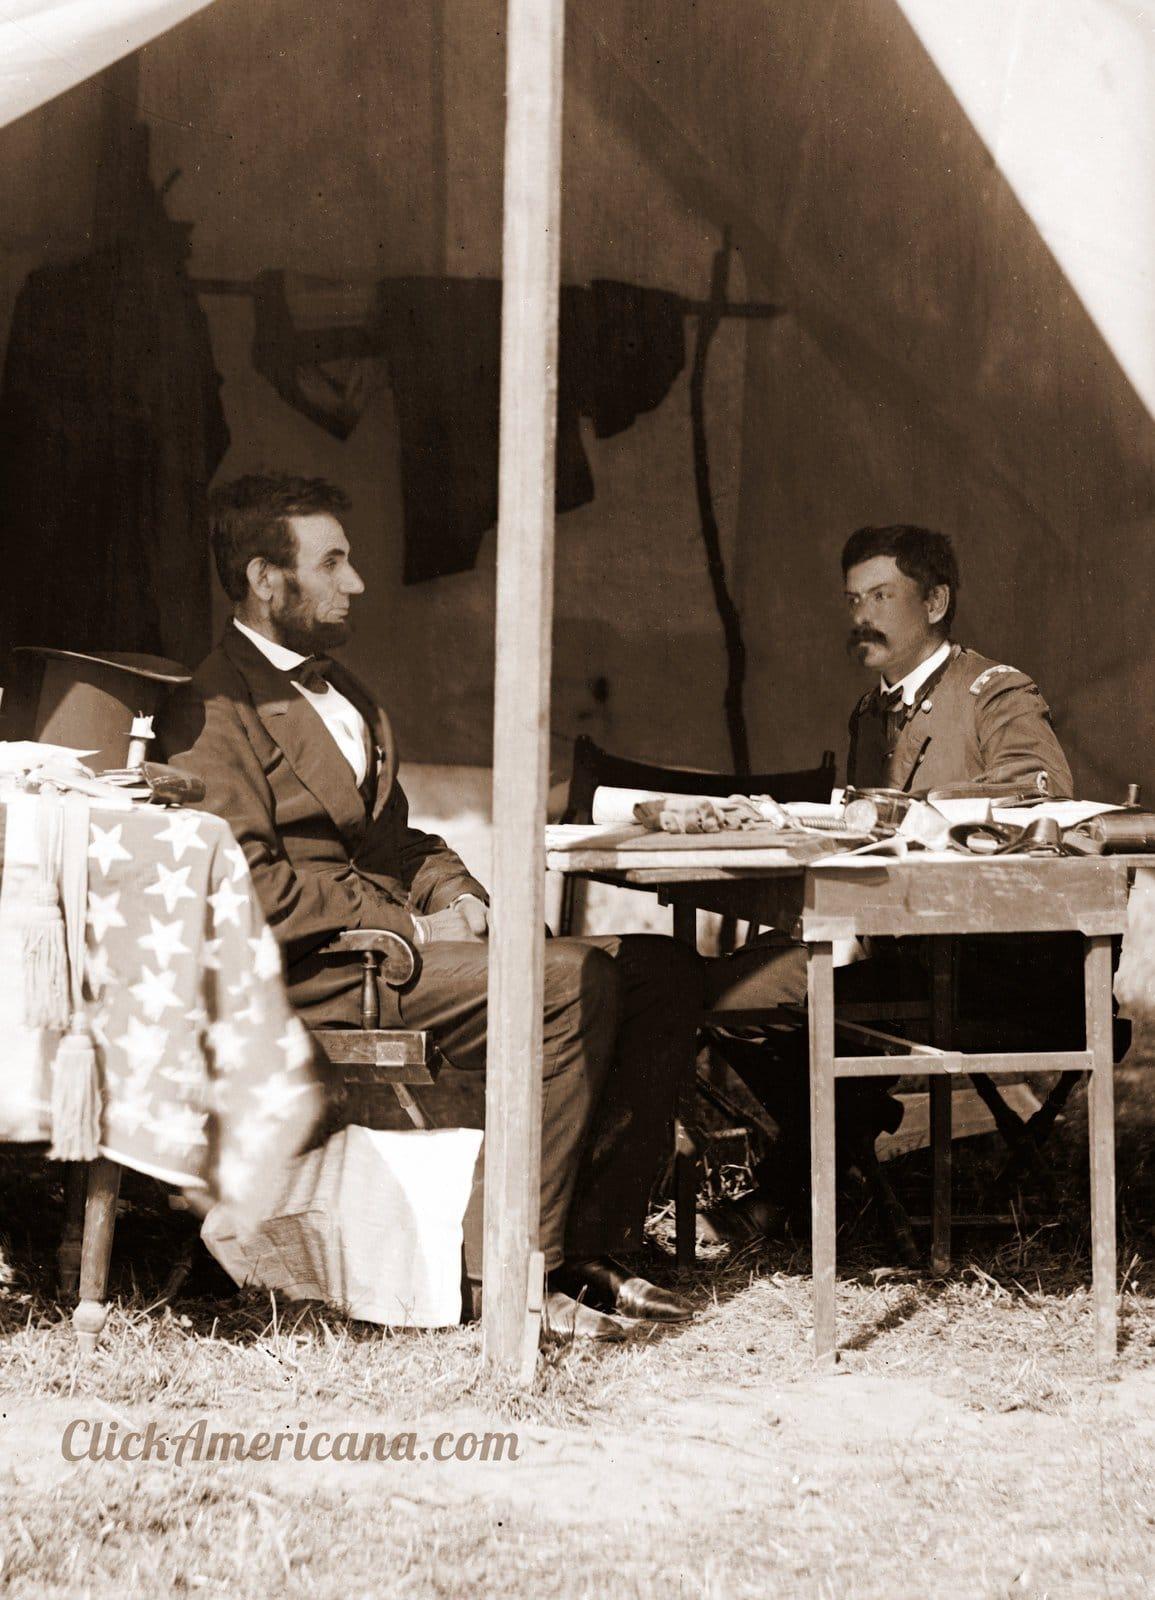 President Lincoln and General McClellan - Battle of Antietam - October 3, 1862 - Restored photo by ClickAmericana com